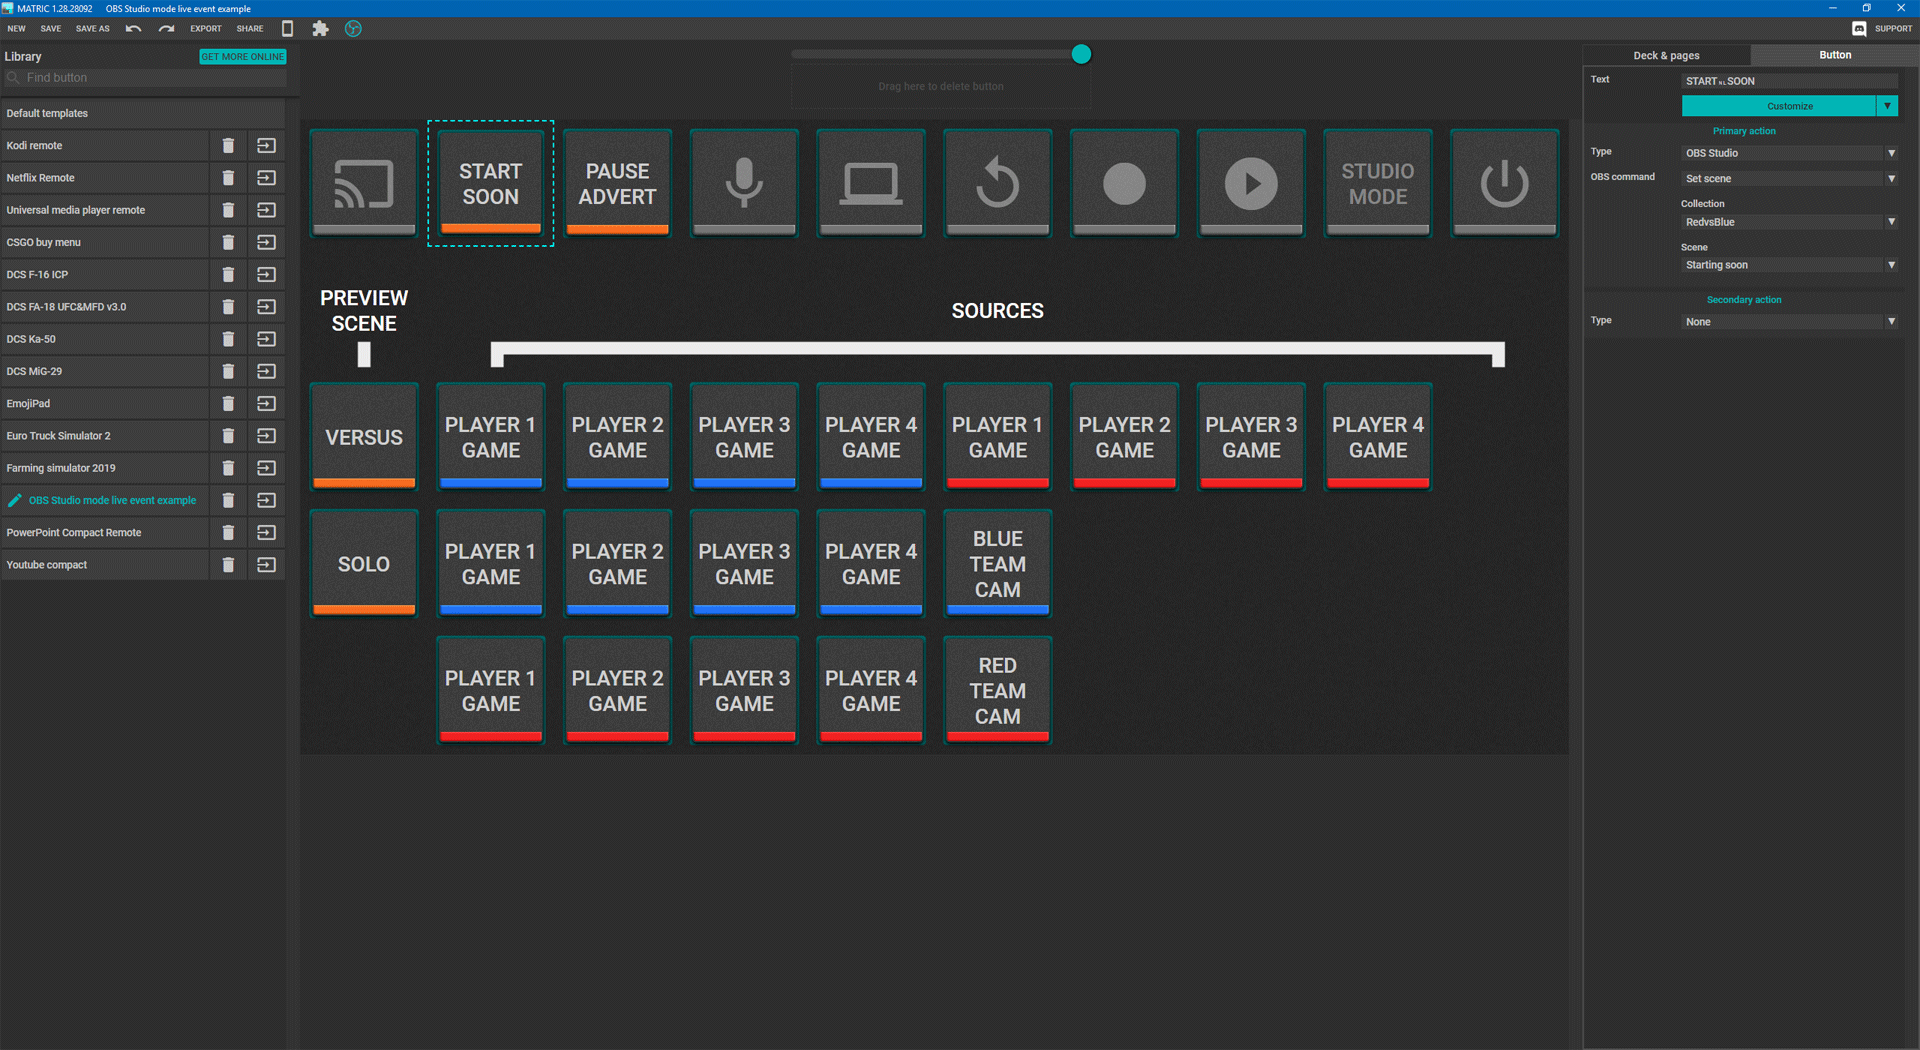 edito-obs-screenshot.png